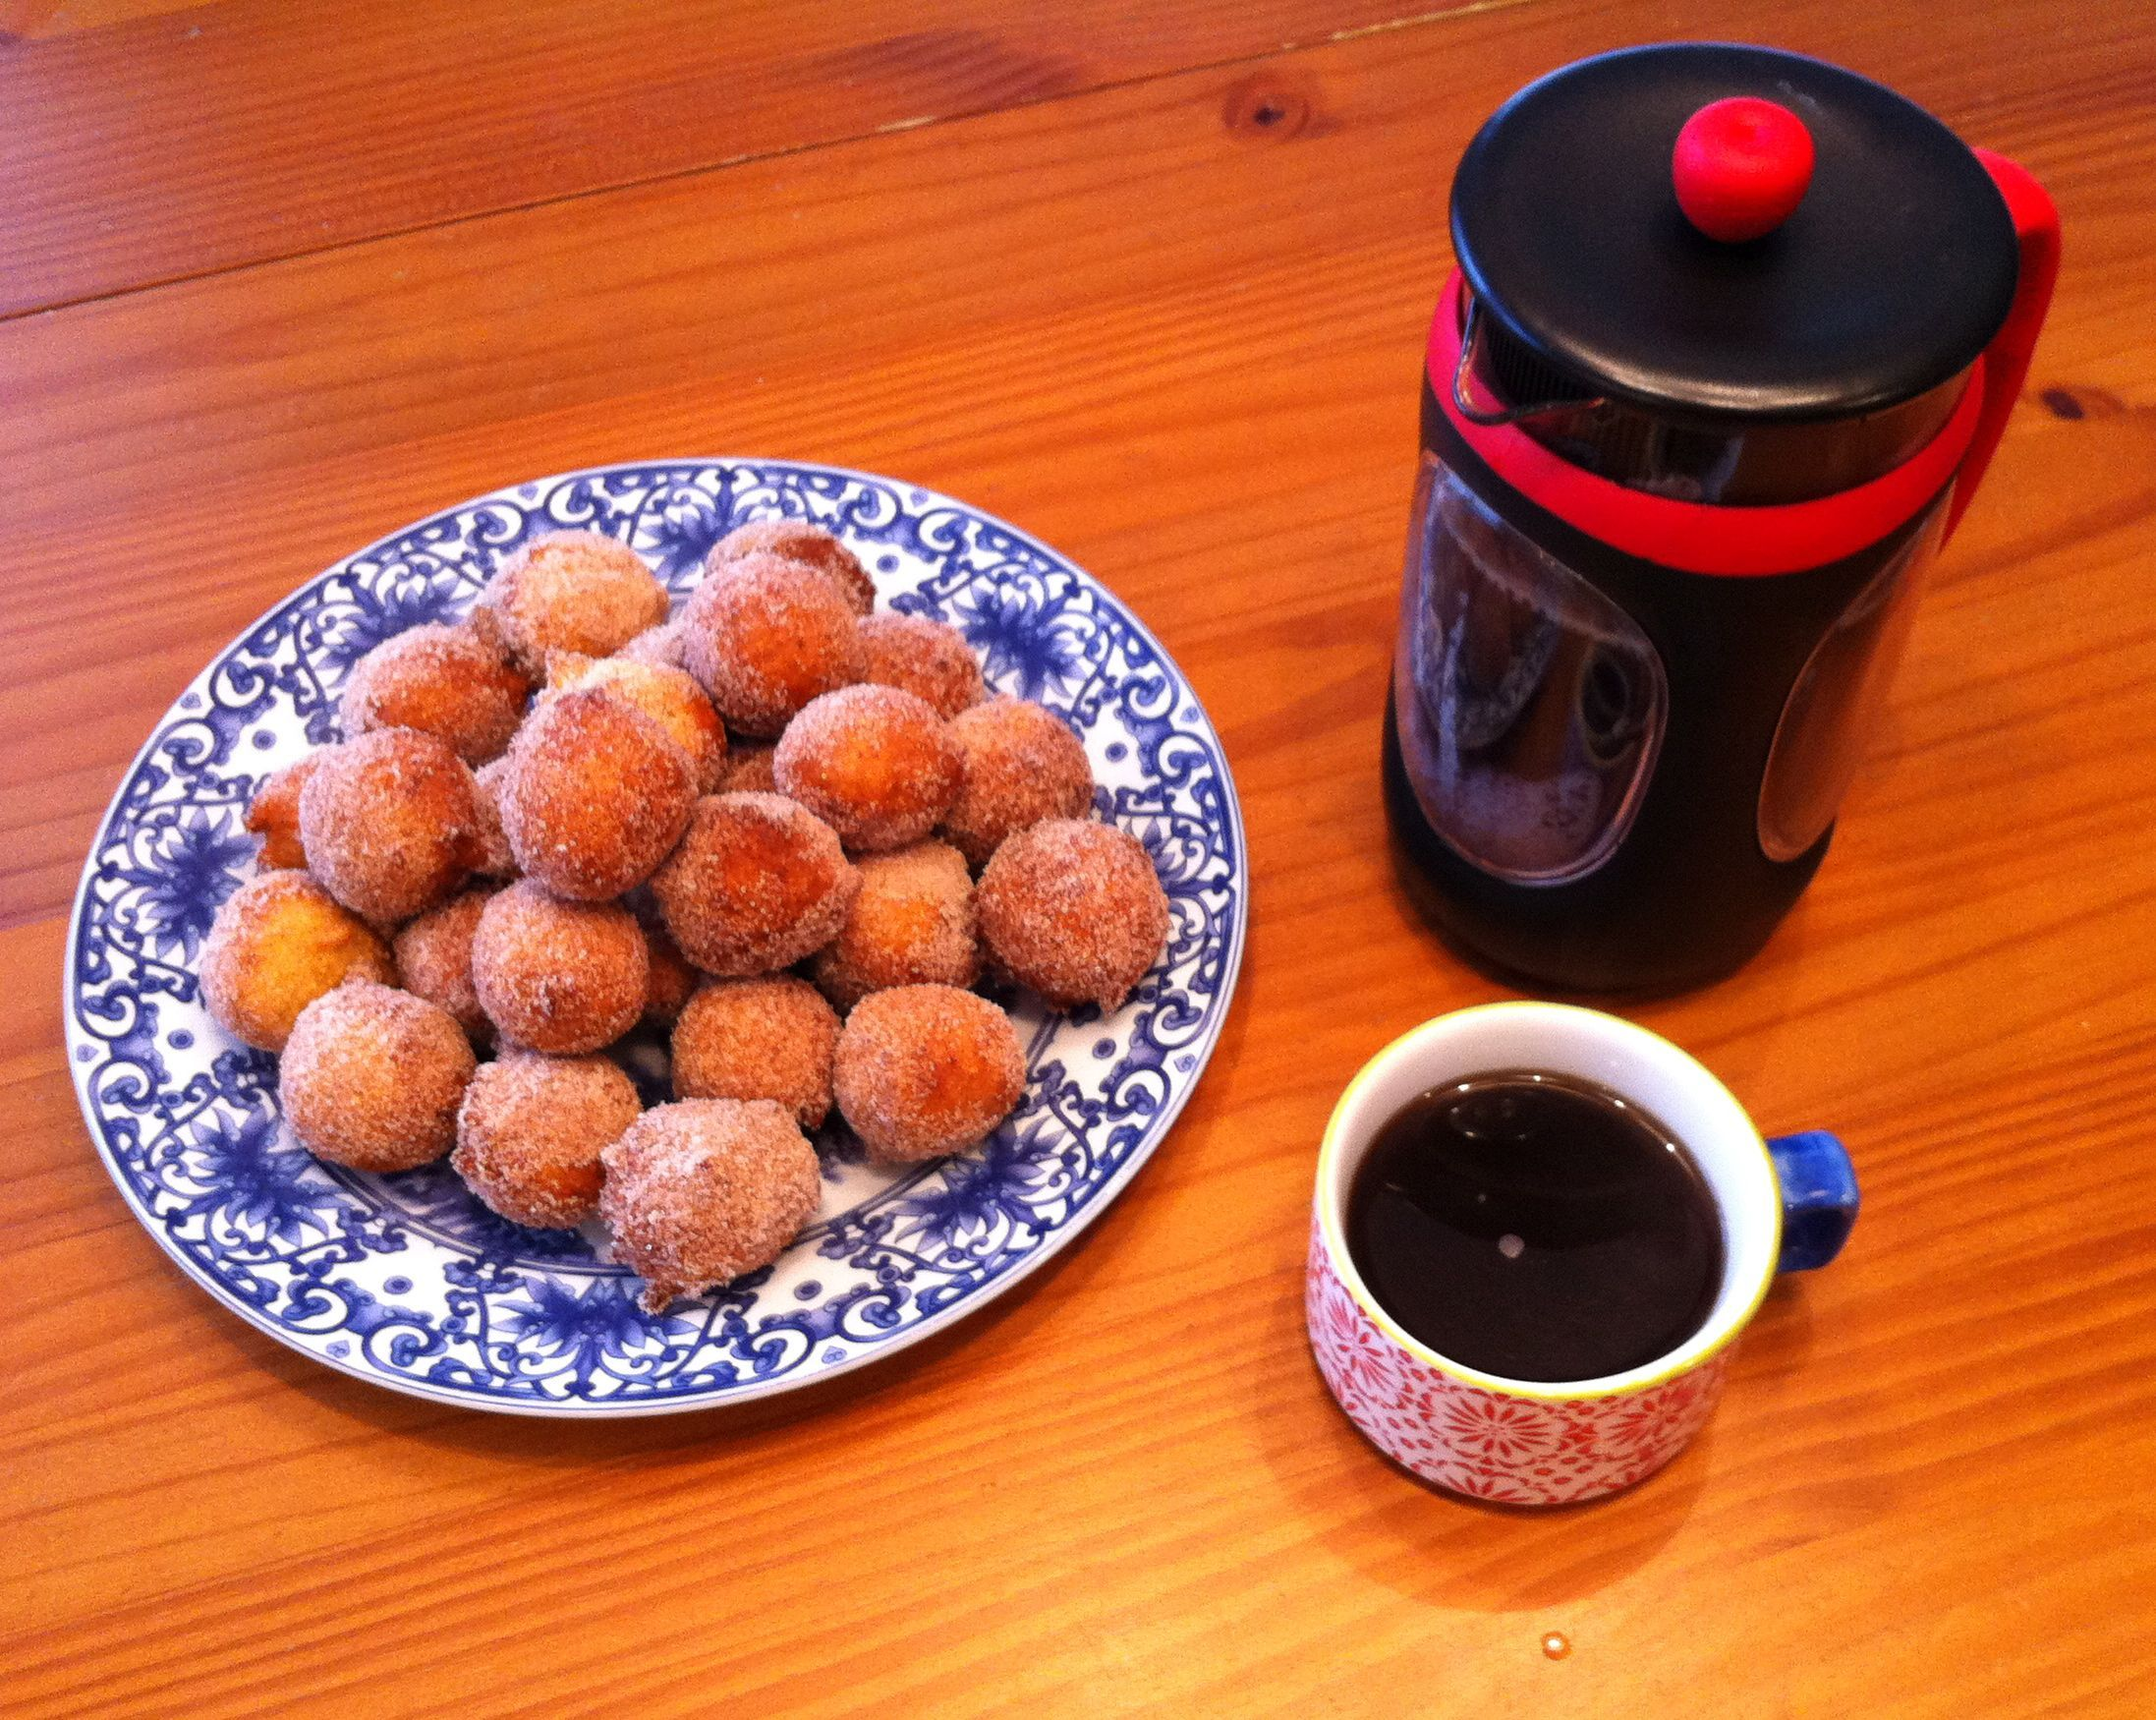 Crispy Cornmeal Drop Donuts - Yum! Like sweet hushpuppies rolled in cinnamon sugar. Got recipe from allrecipes.com